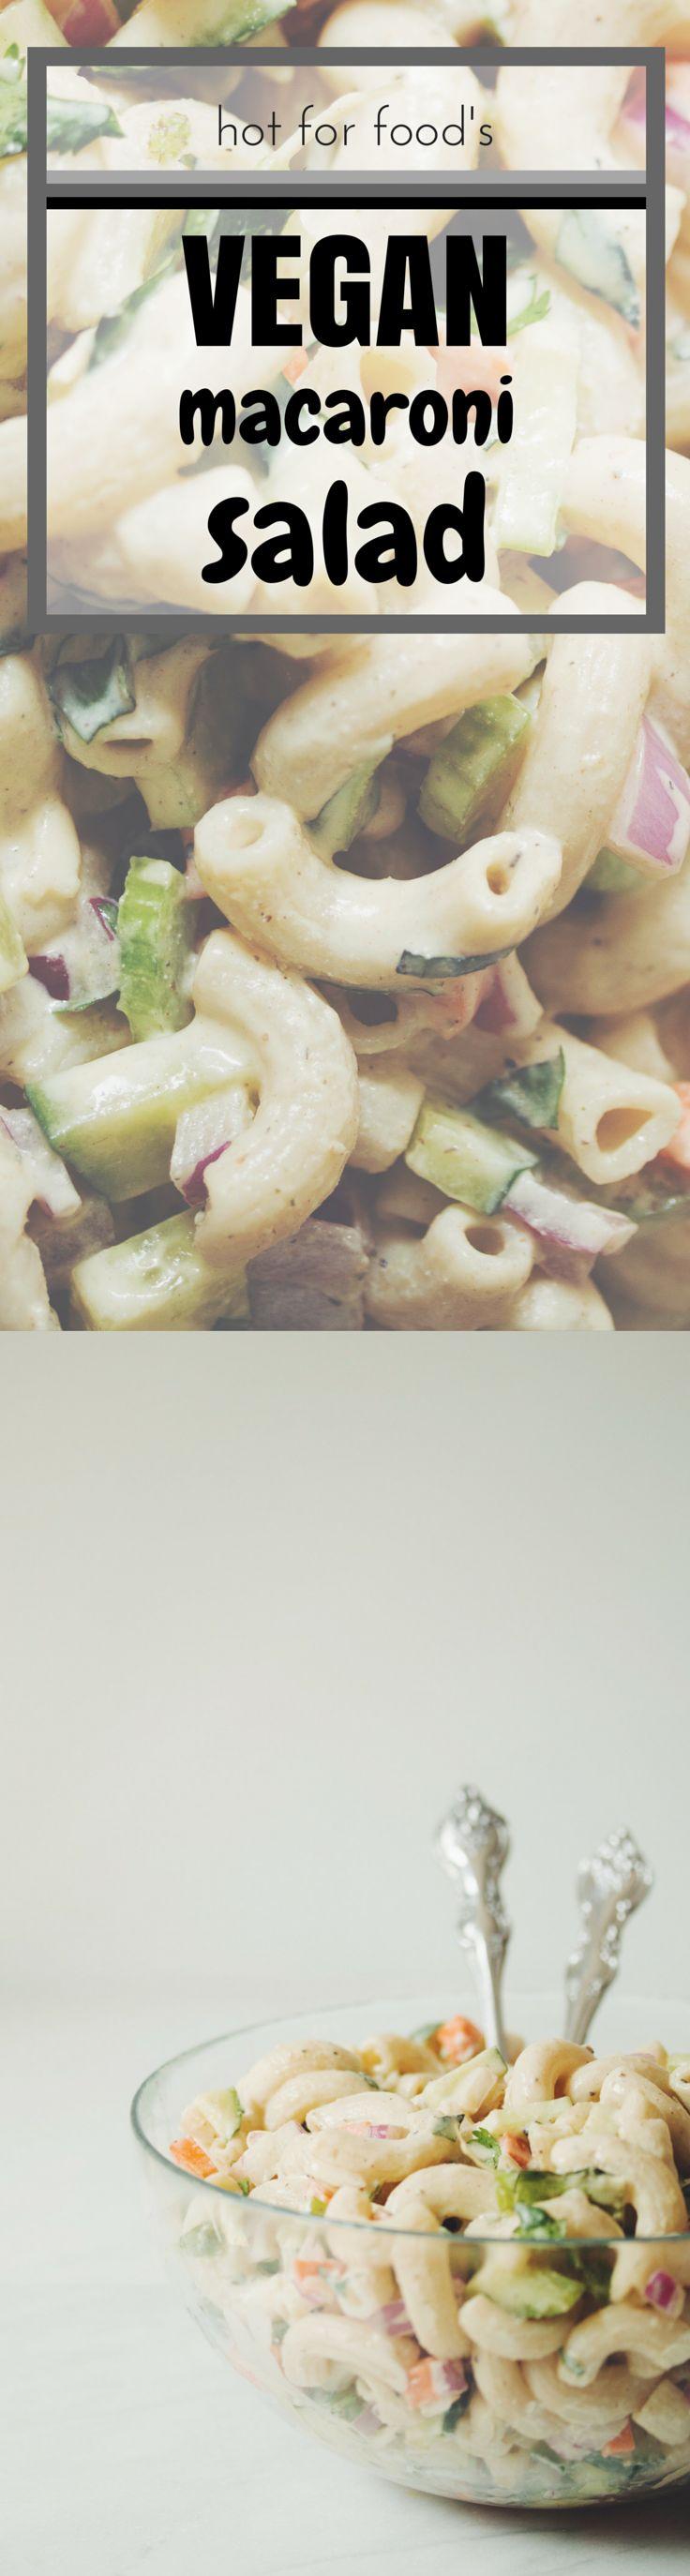 the best vegan macaroni salad | RECIPE on hotforfoodblog.com